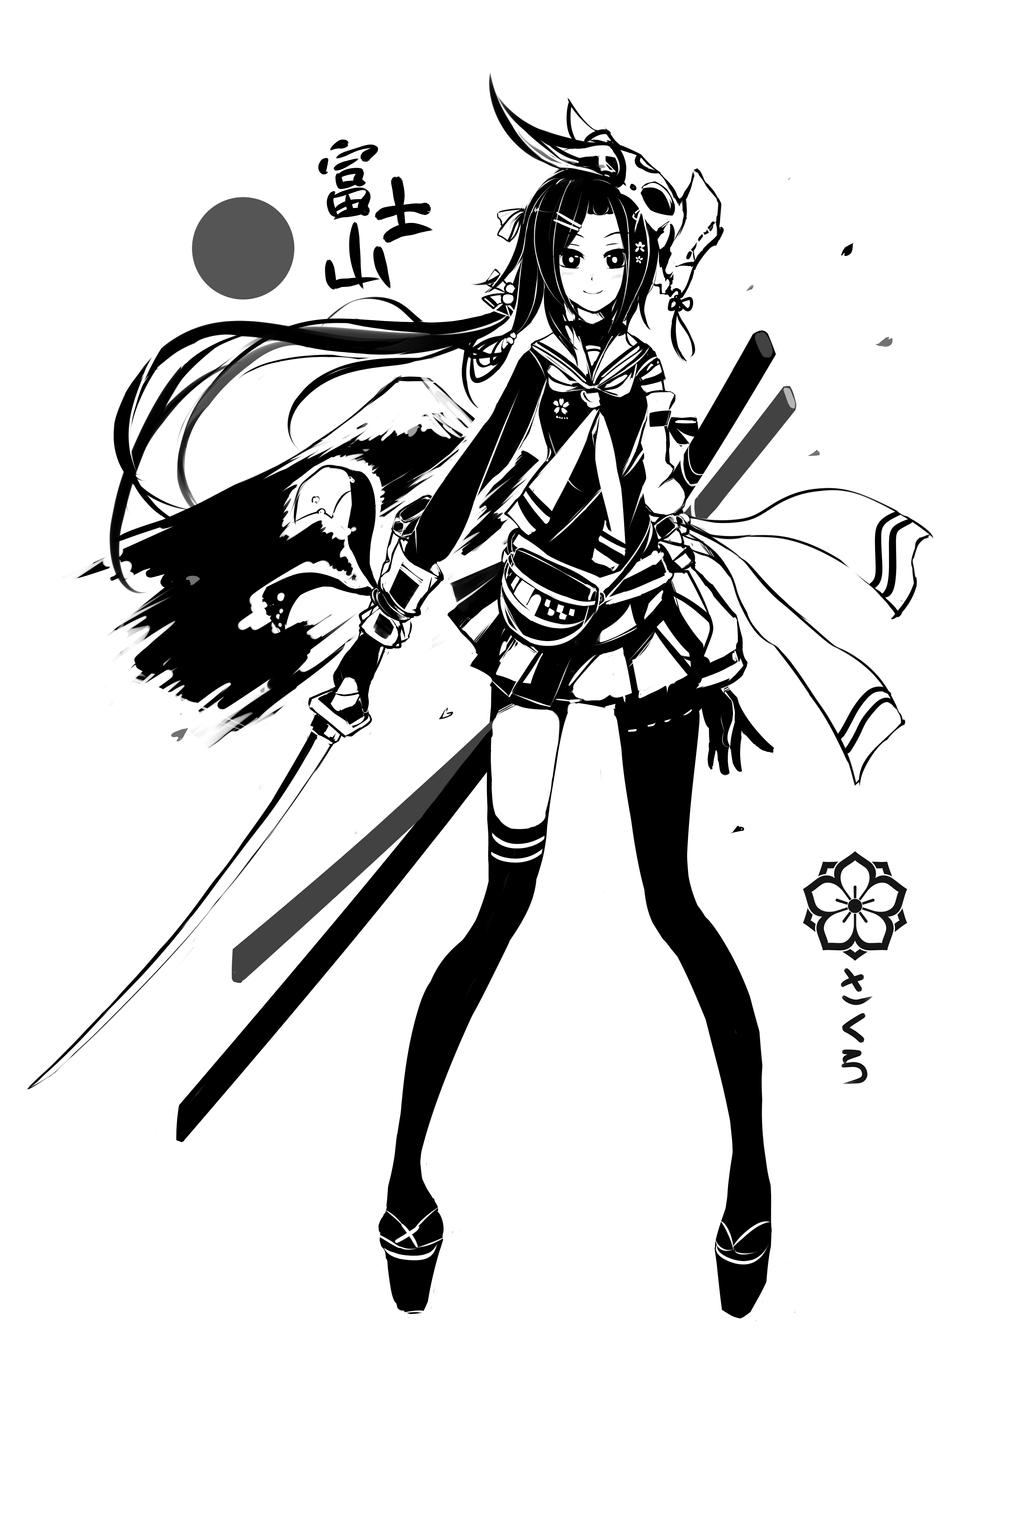 Mascot - Samurai by Sekigan